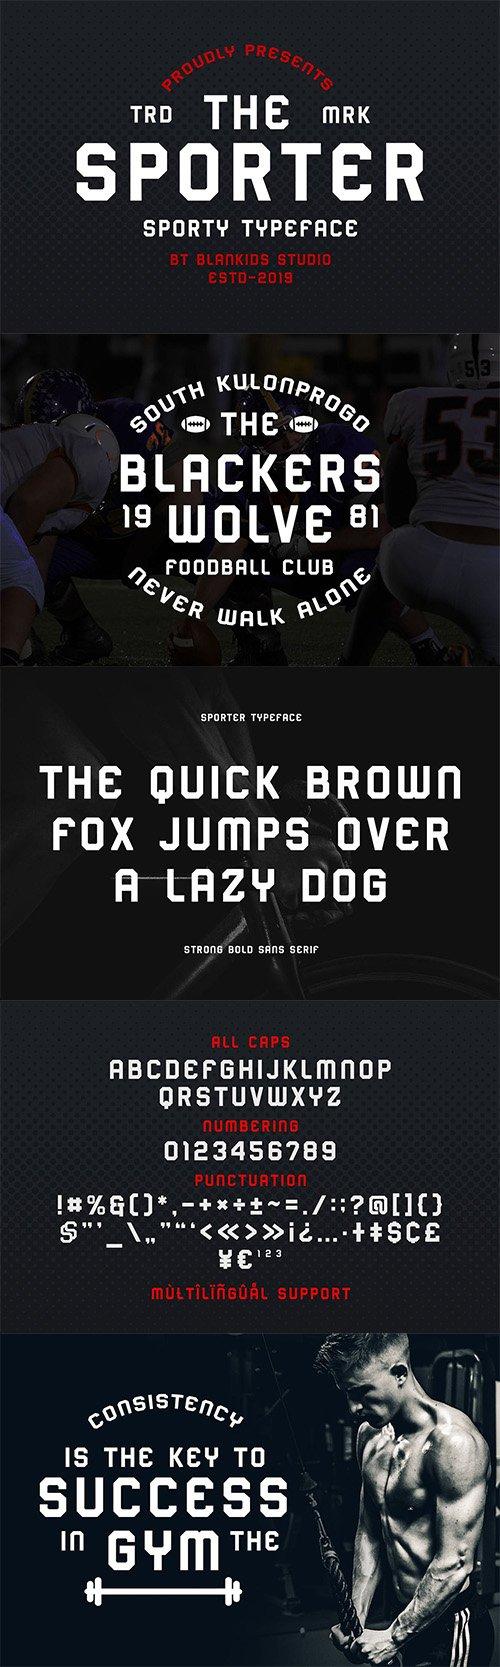 Sporter - Sporty Display Typeface